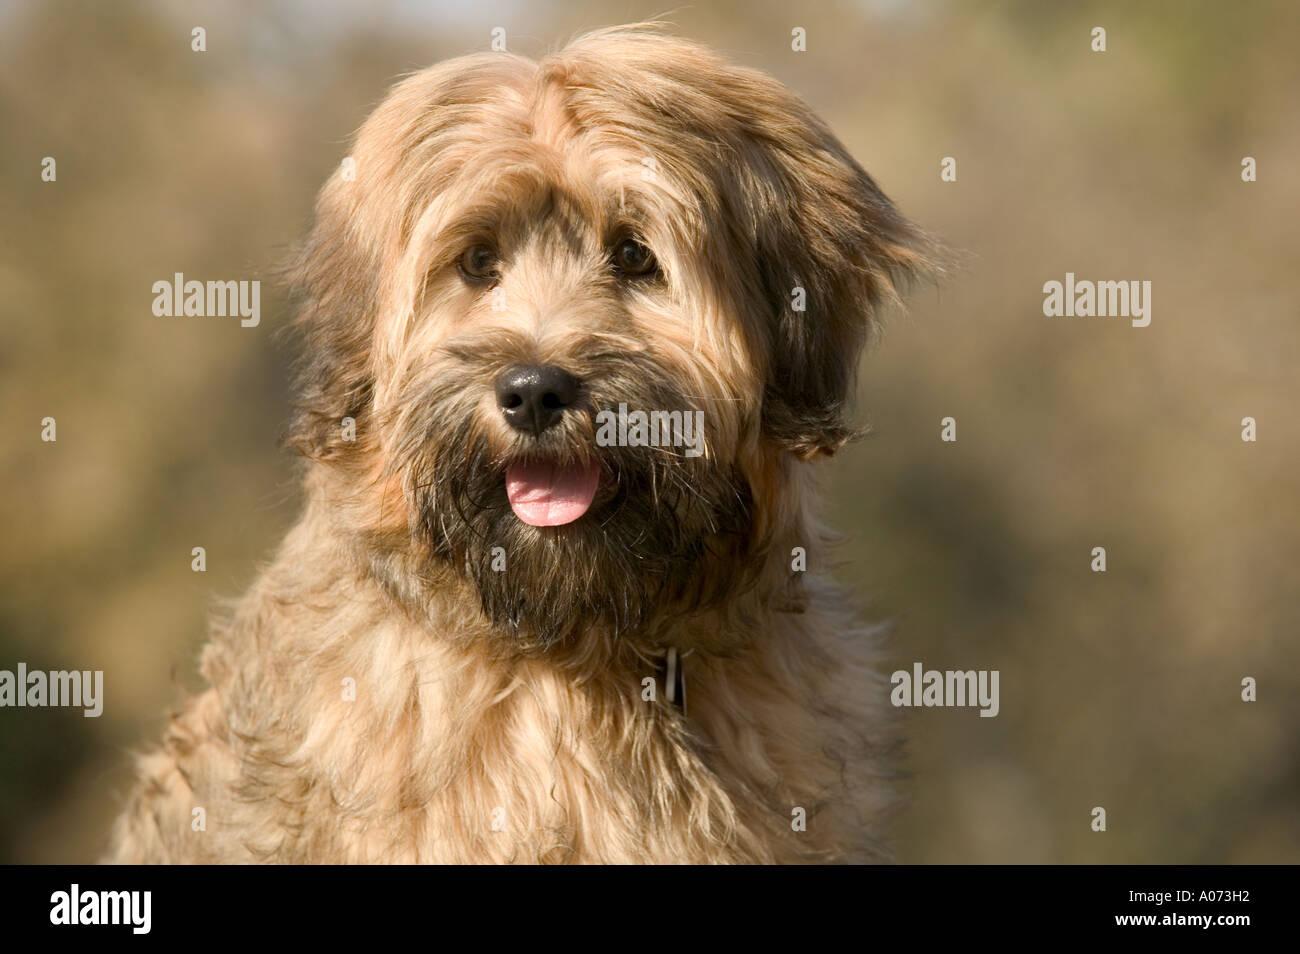 Tibetan Terrier purebred dog model released image - Stock Image